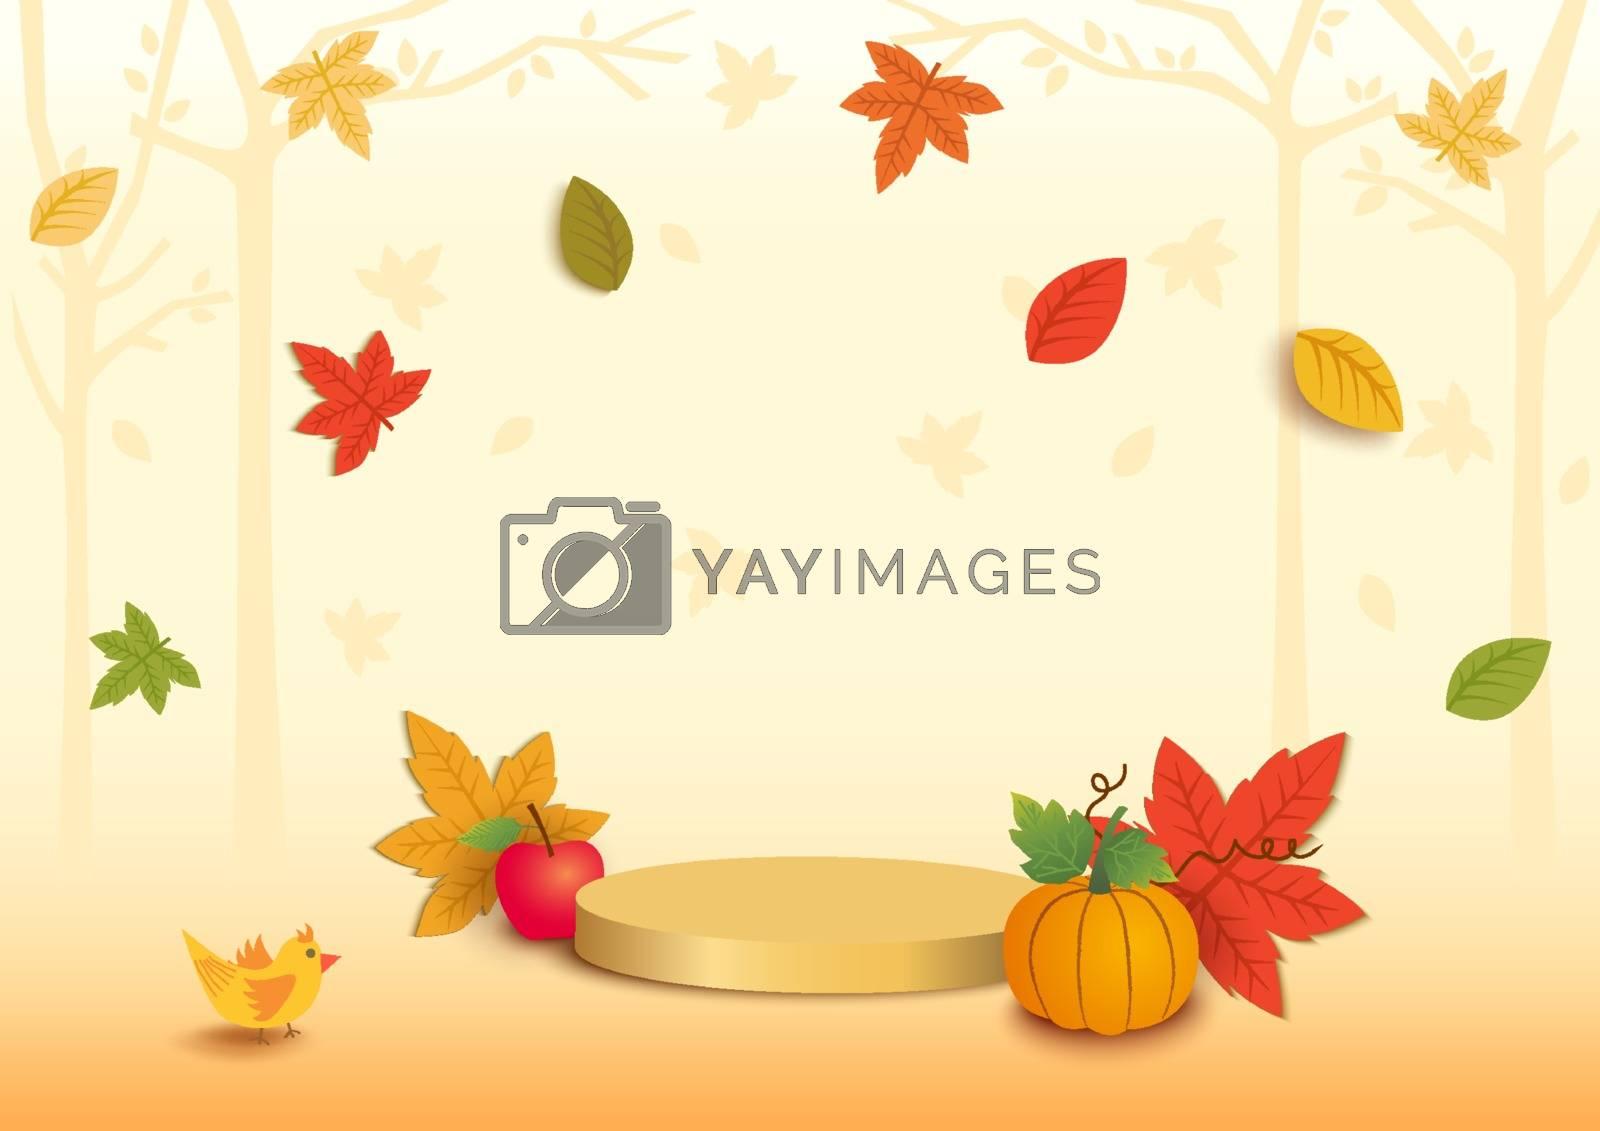 Illustration of Autumn season with platform background